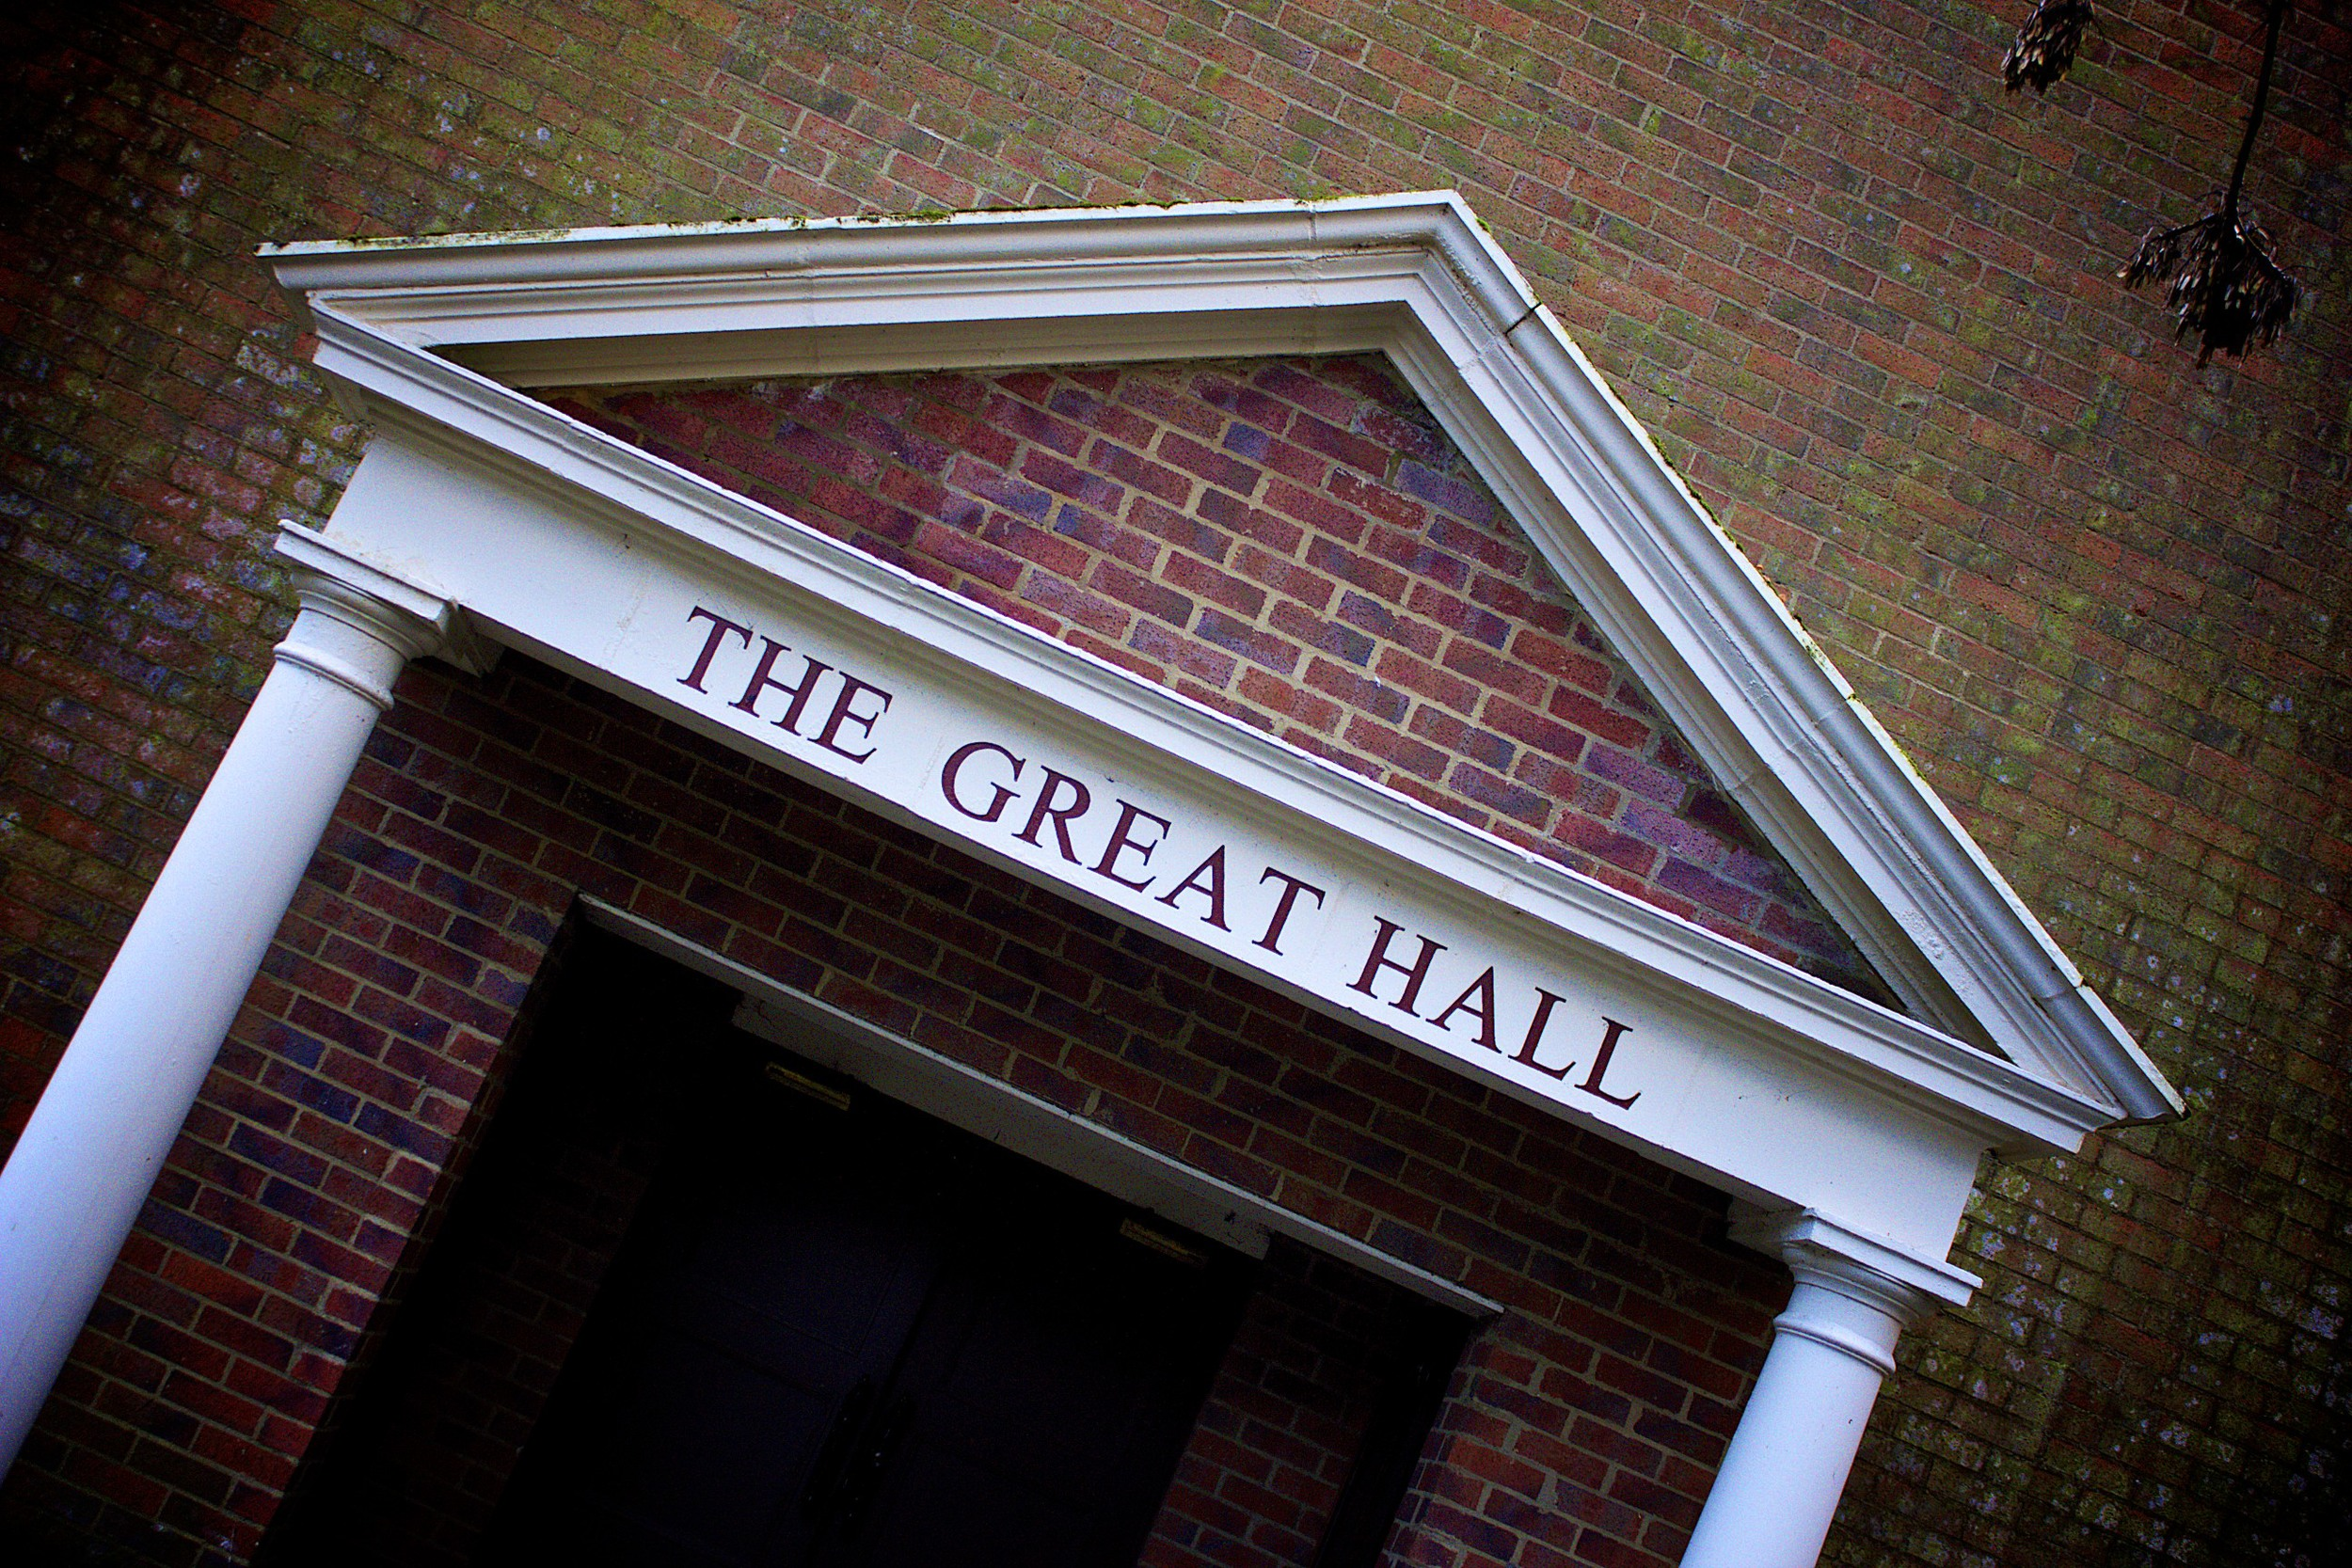 Redworth Hall 550D 1673.jpg